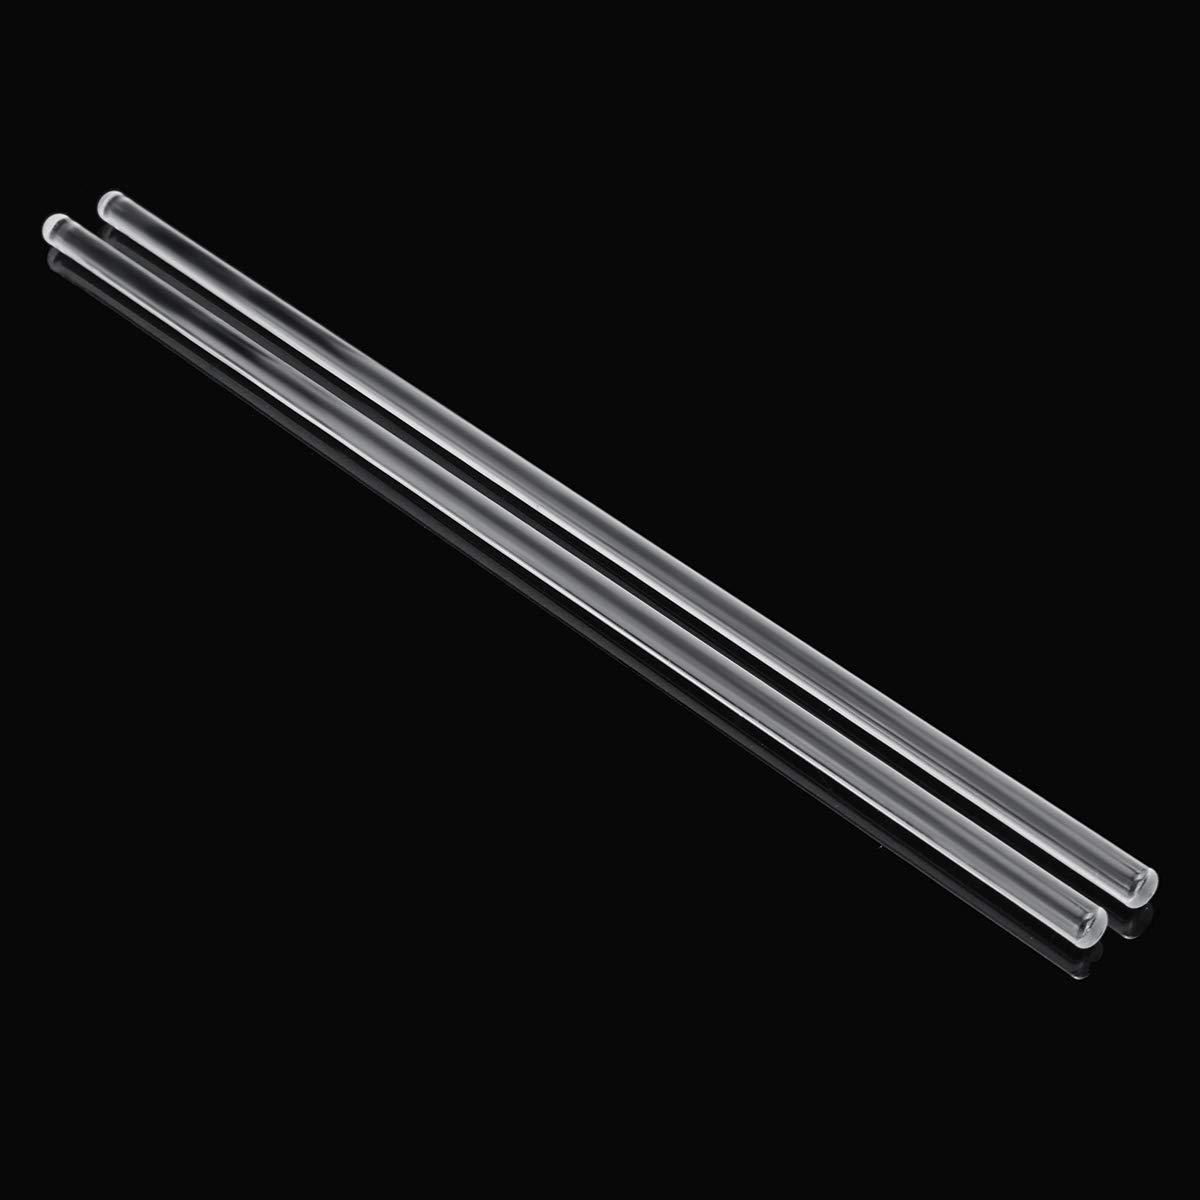 CocinaCo 2Pcs 250mm Glass Stirring Mixing Rod Stirrer Mixer Sticks Rods Laboratory Experiment Glassware